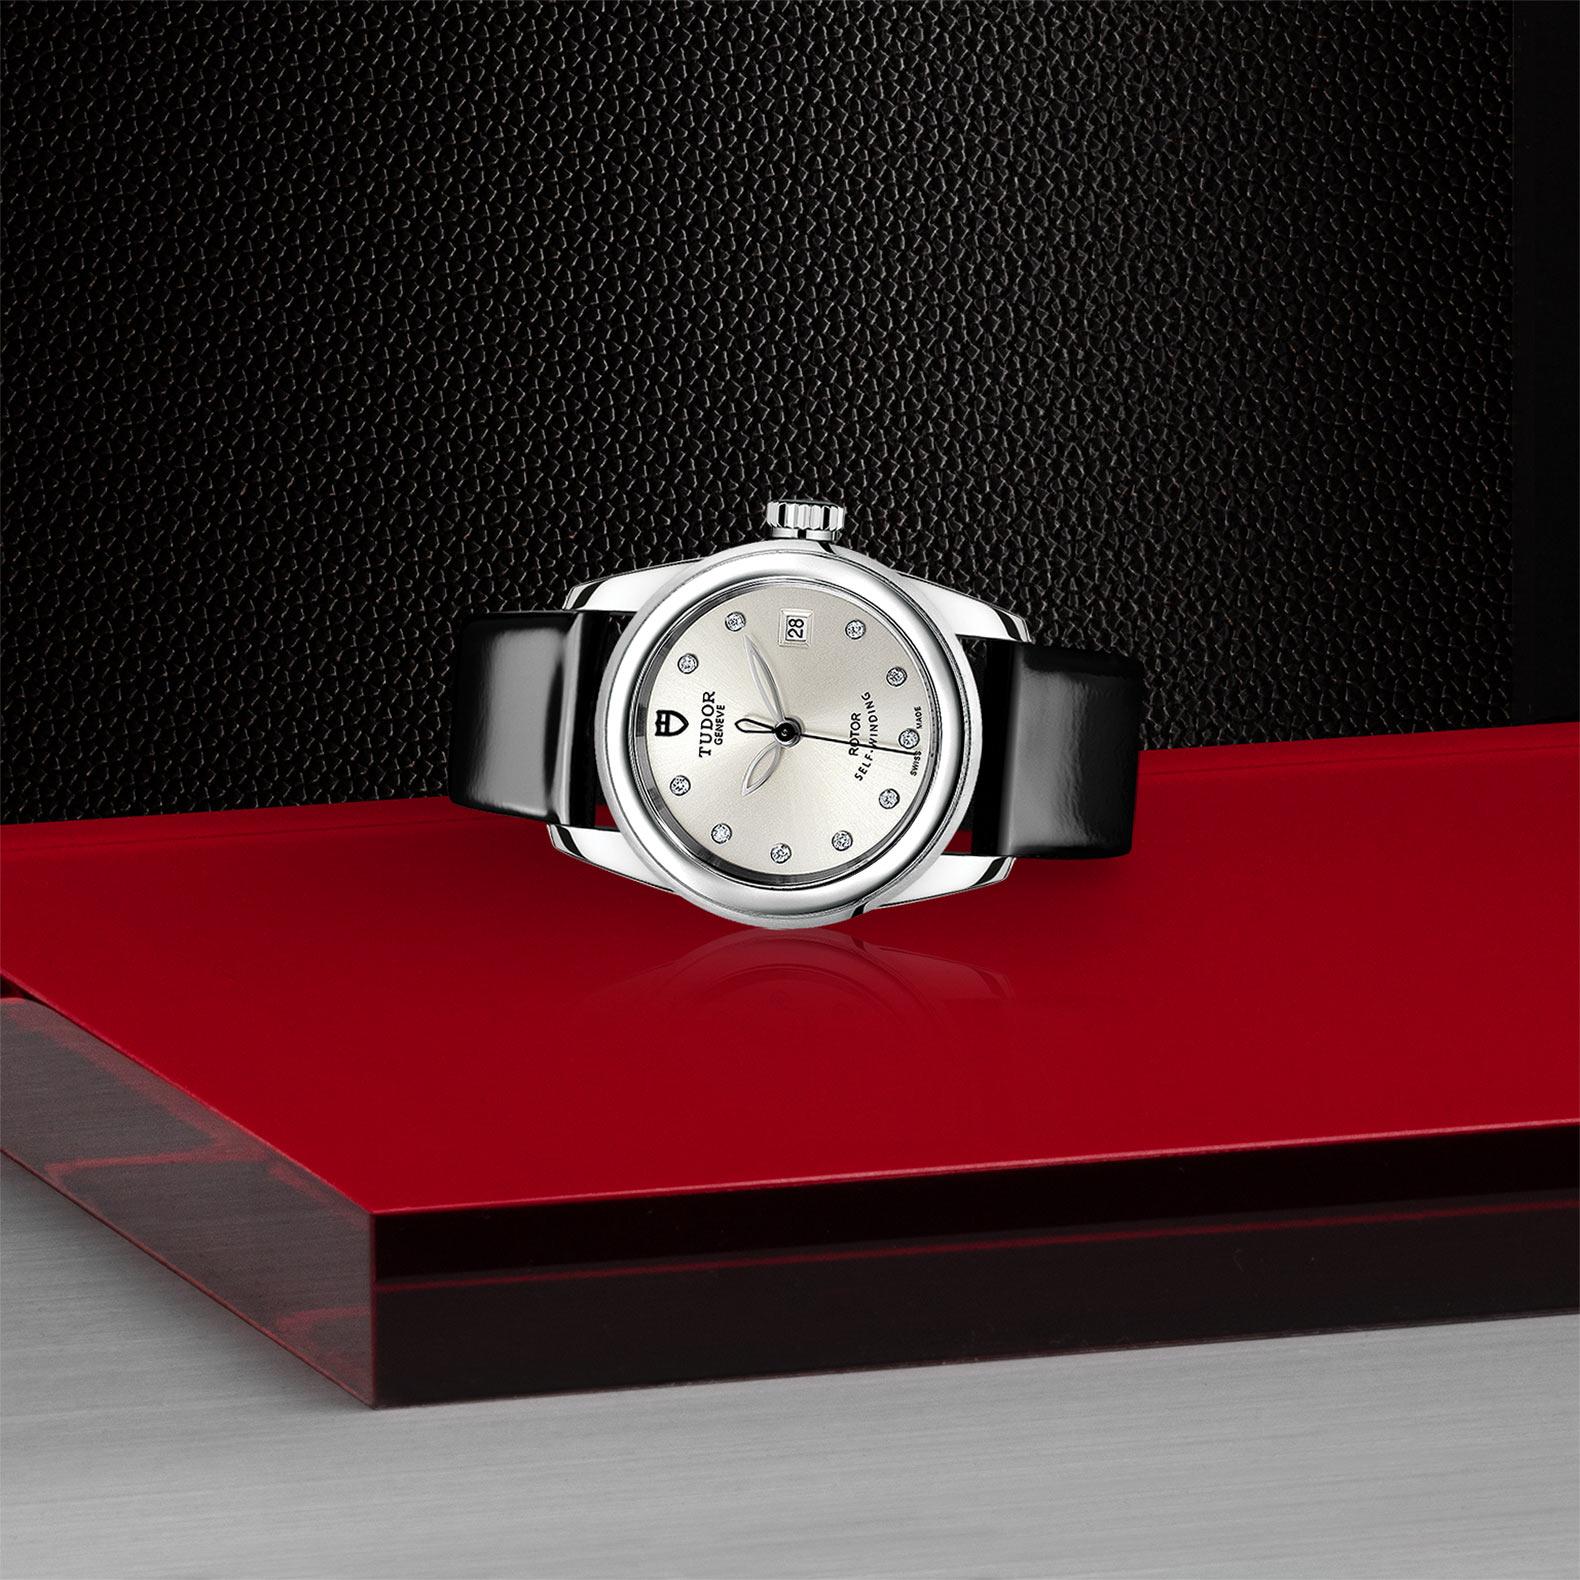 TUDOR Glamour Date - M51000-0019